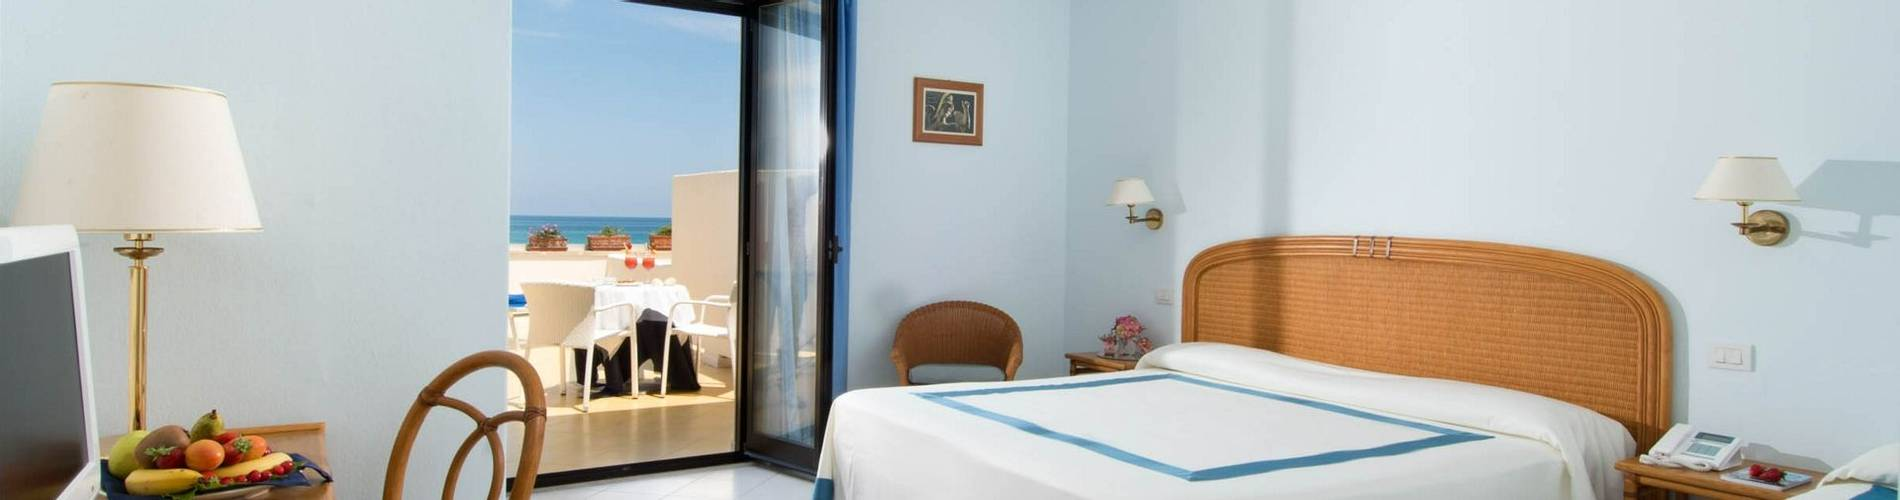 Del Levante, Puglia, Italy, Family Room.jpg